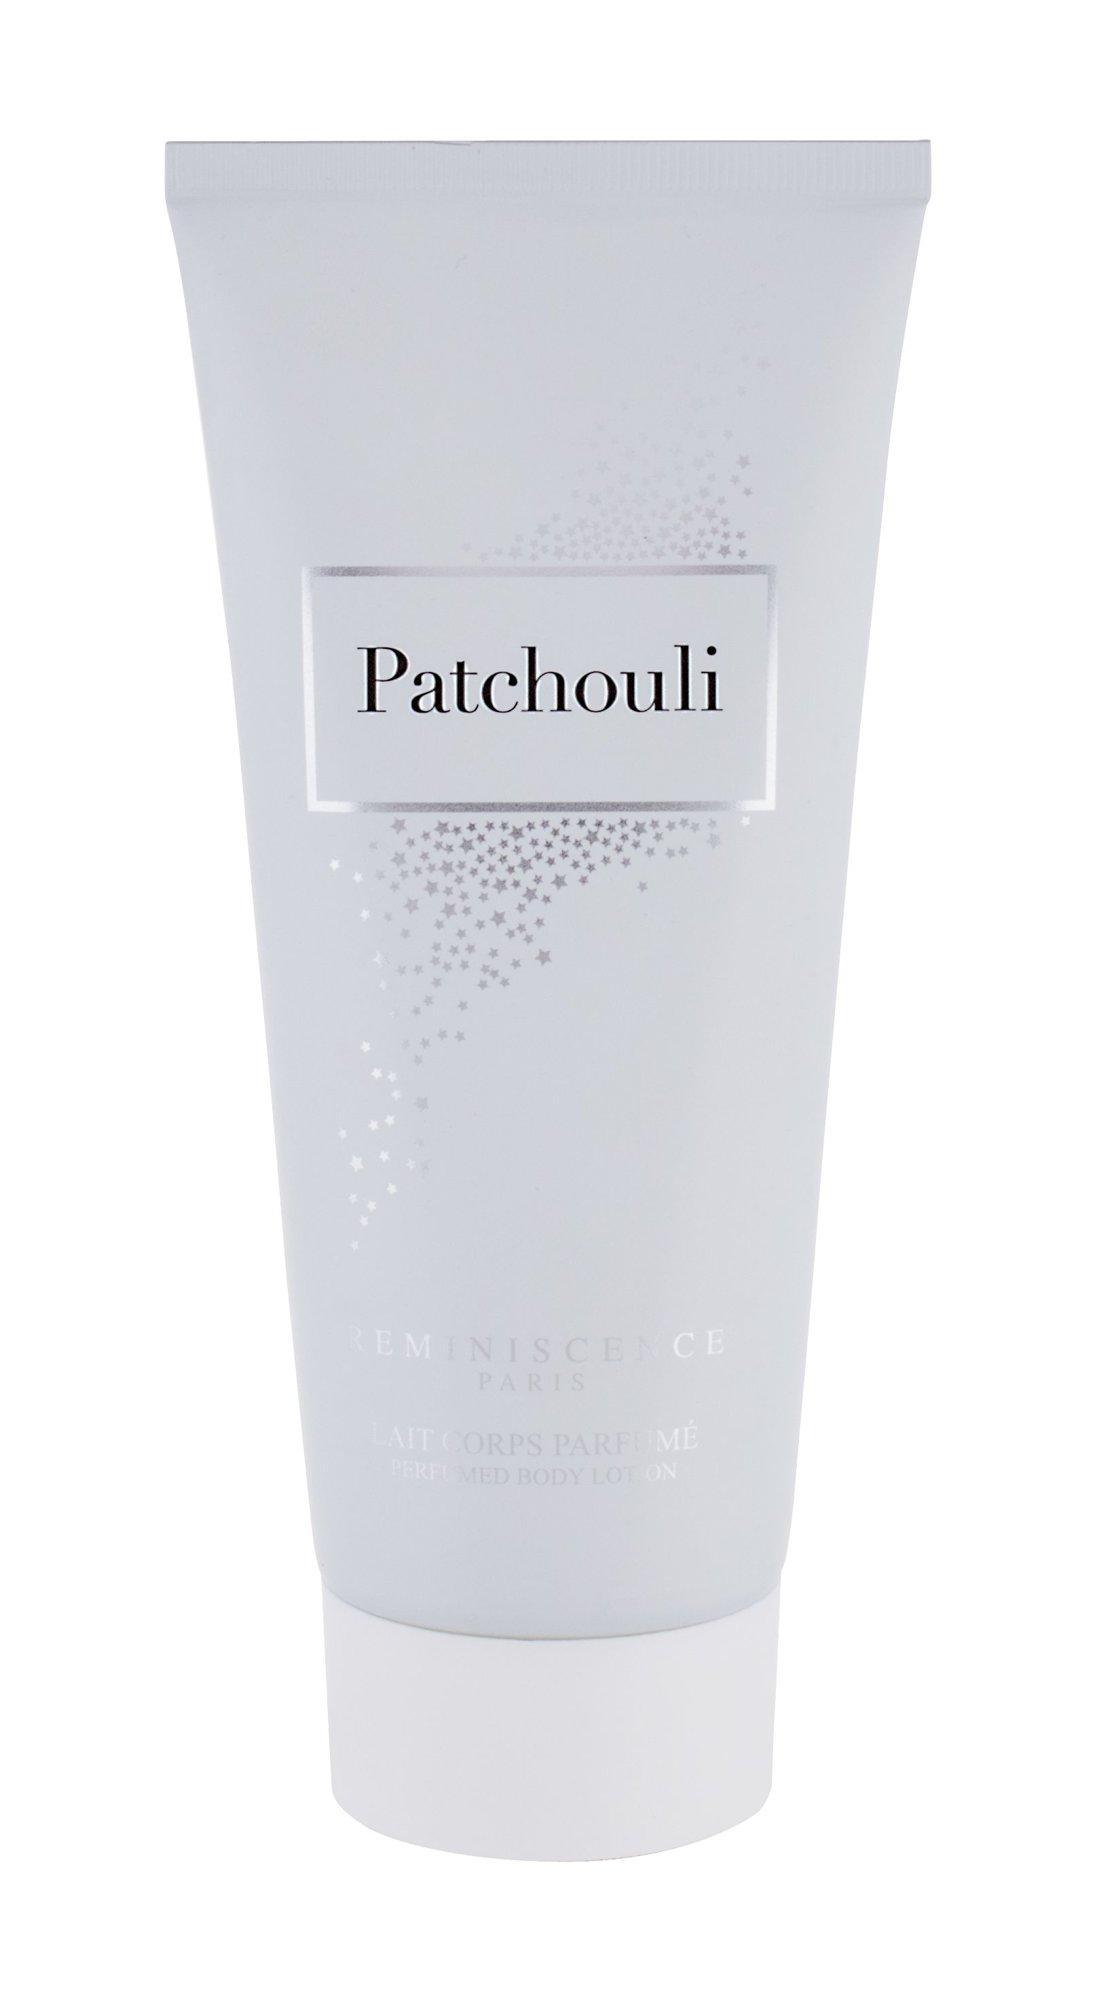 Reminiscence Patchouli Body lotion 200ml